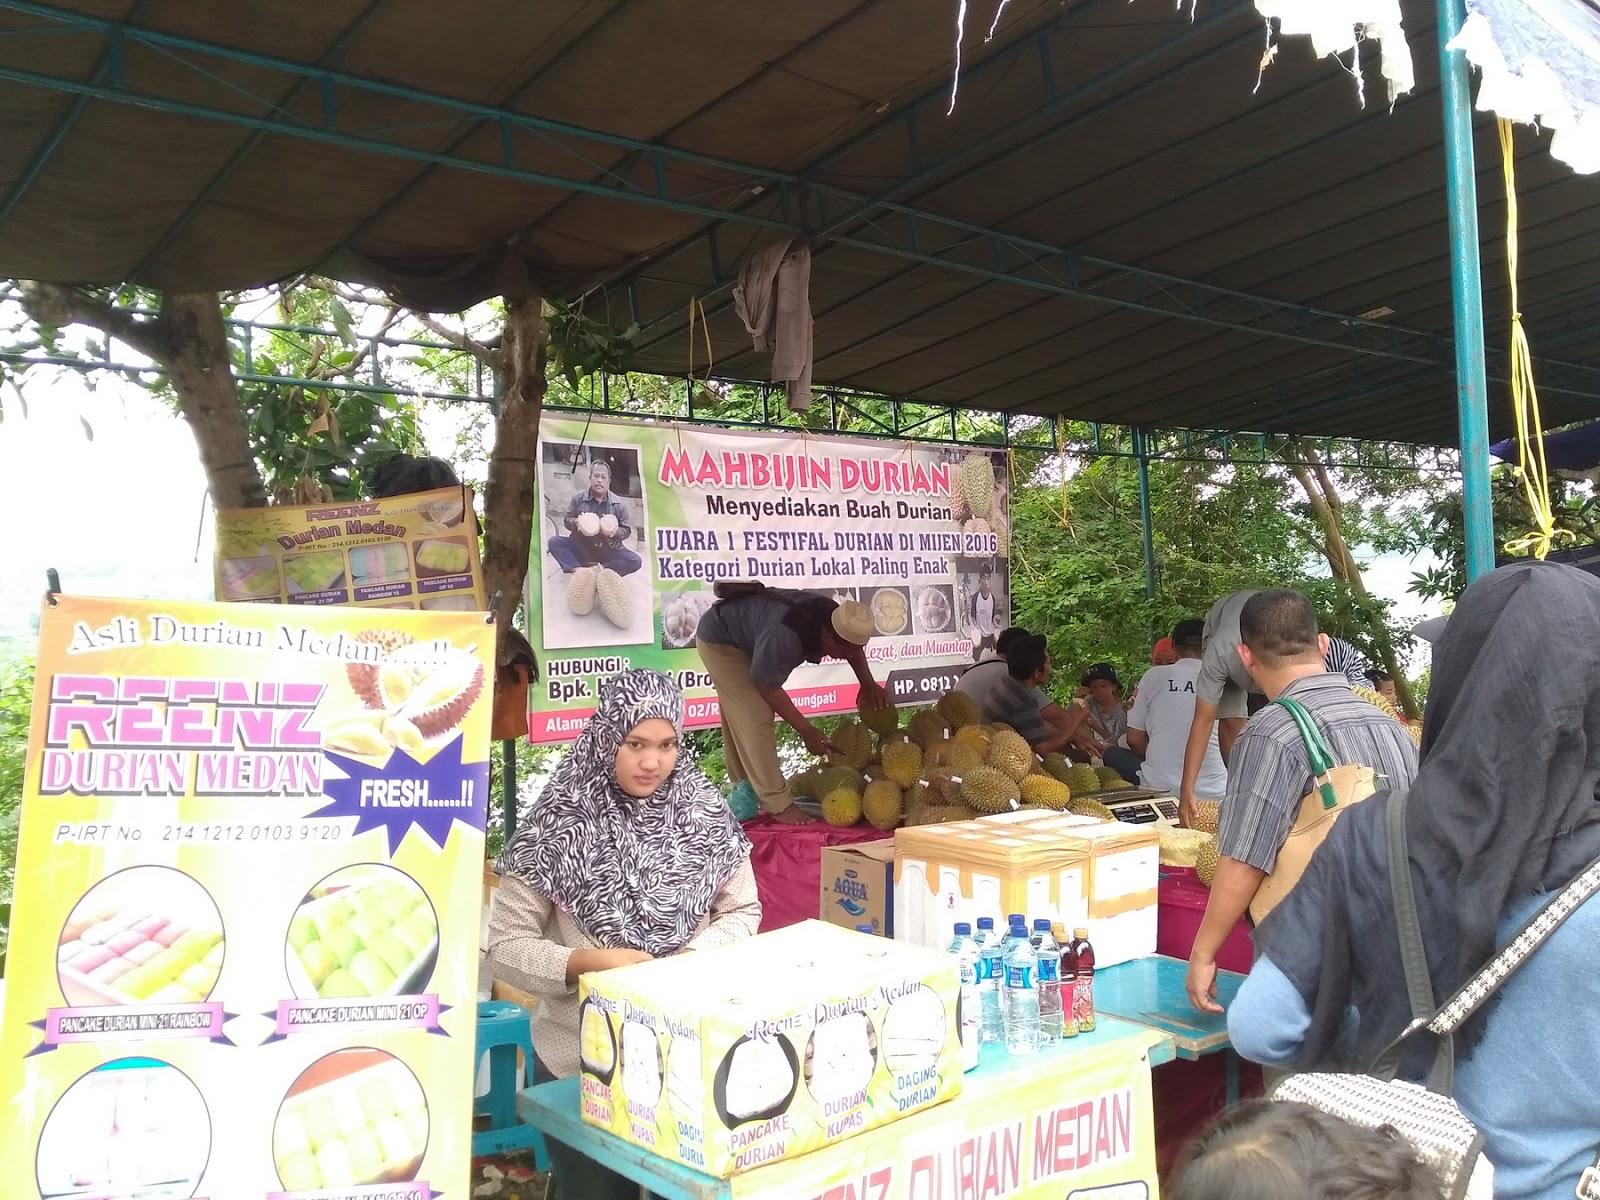 Semarang Coret Lezatnya Festival Durian Gua Kreo Kebun Wisata Edukasi